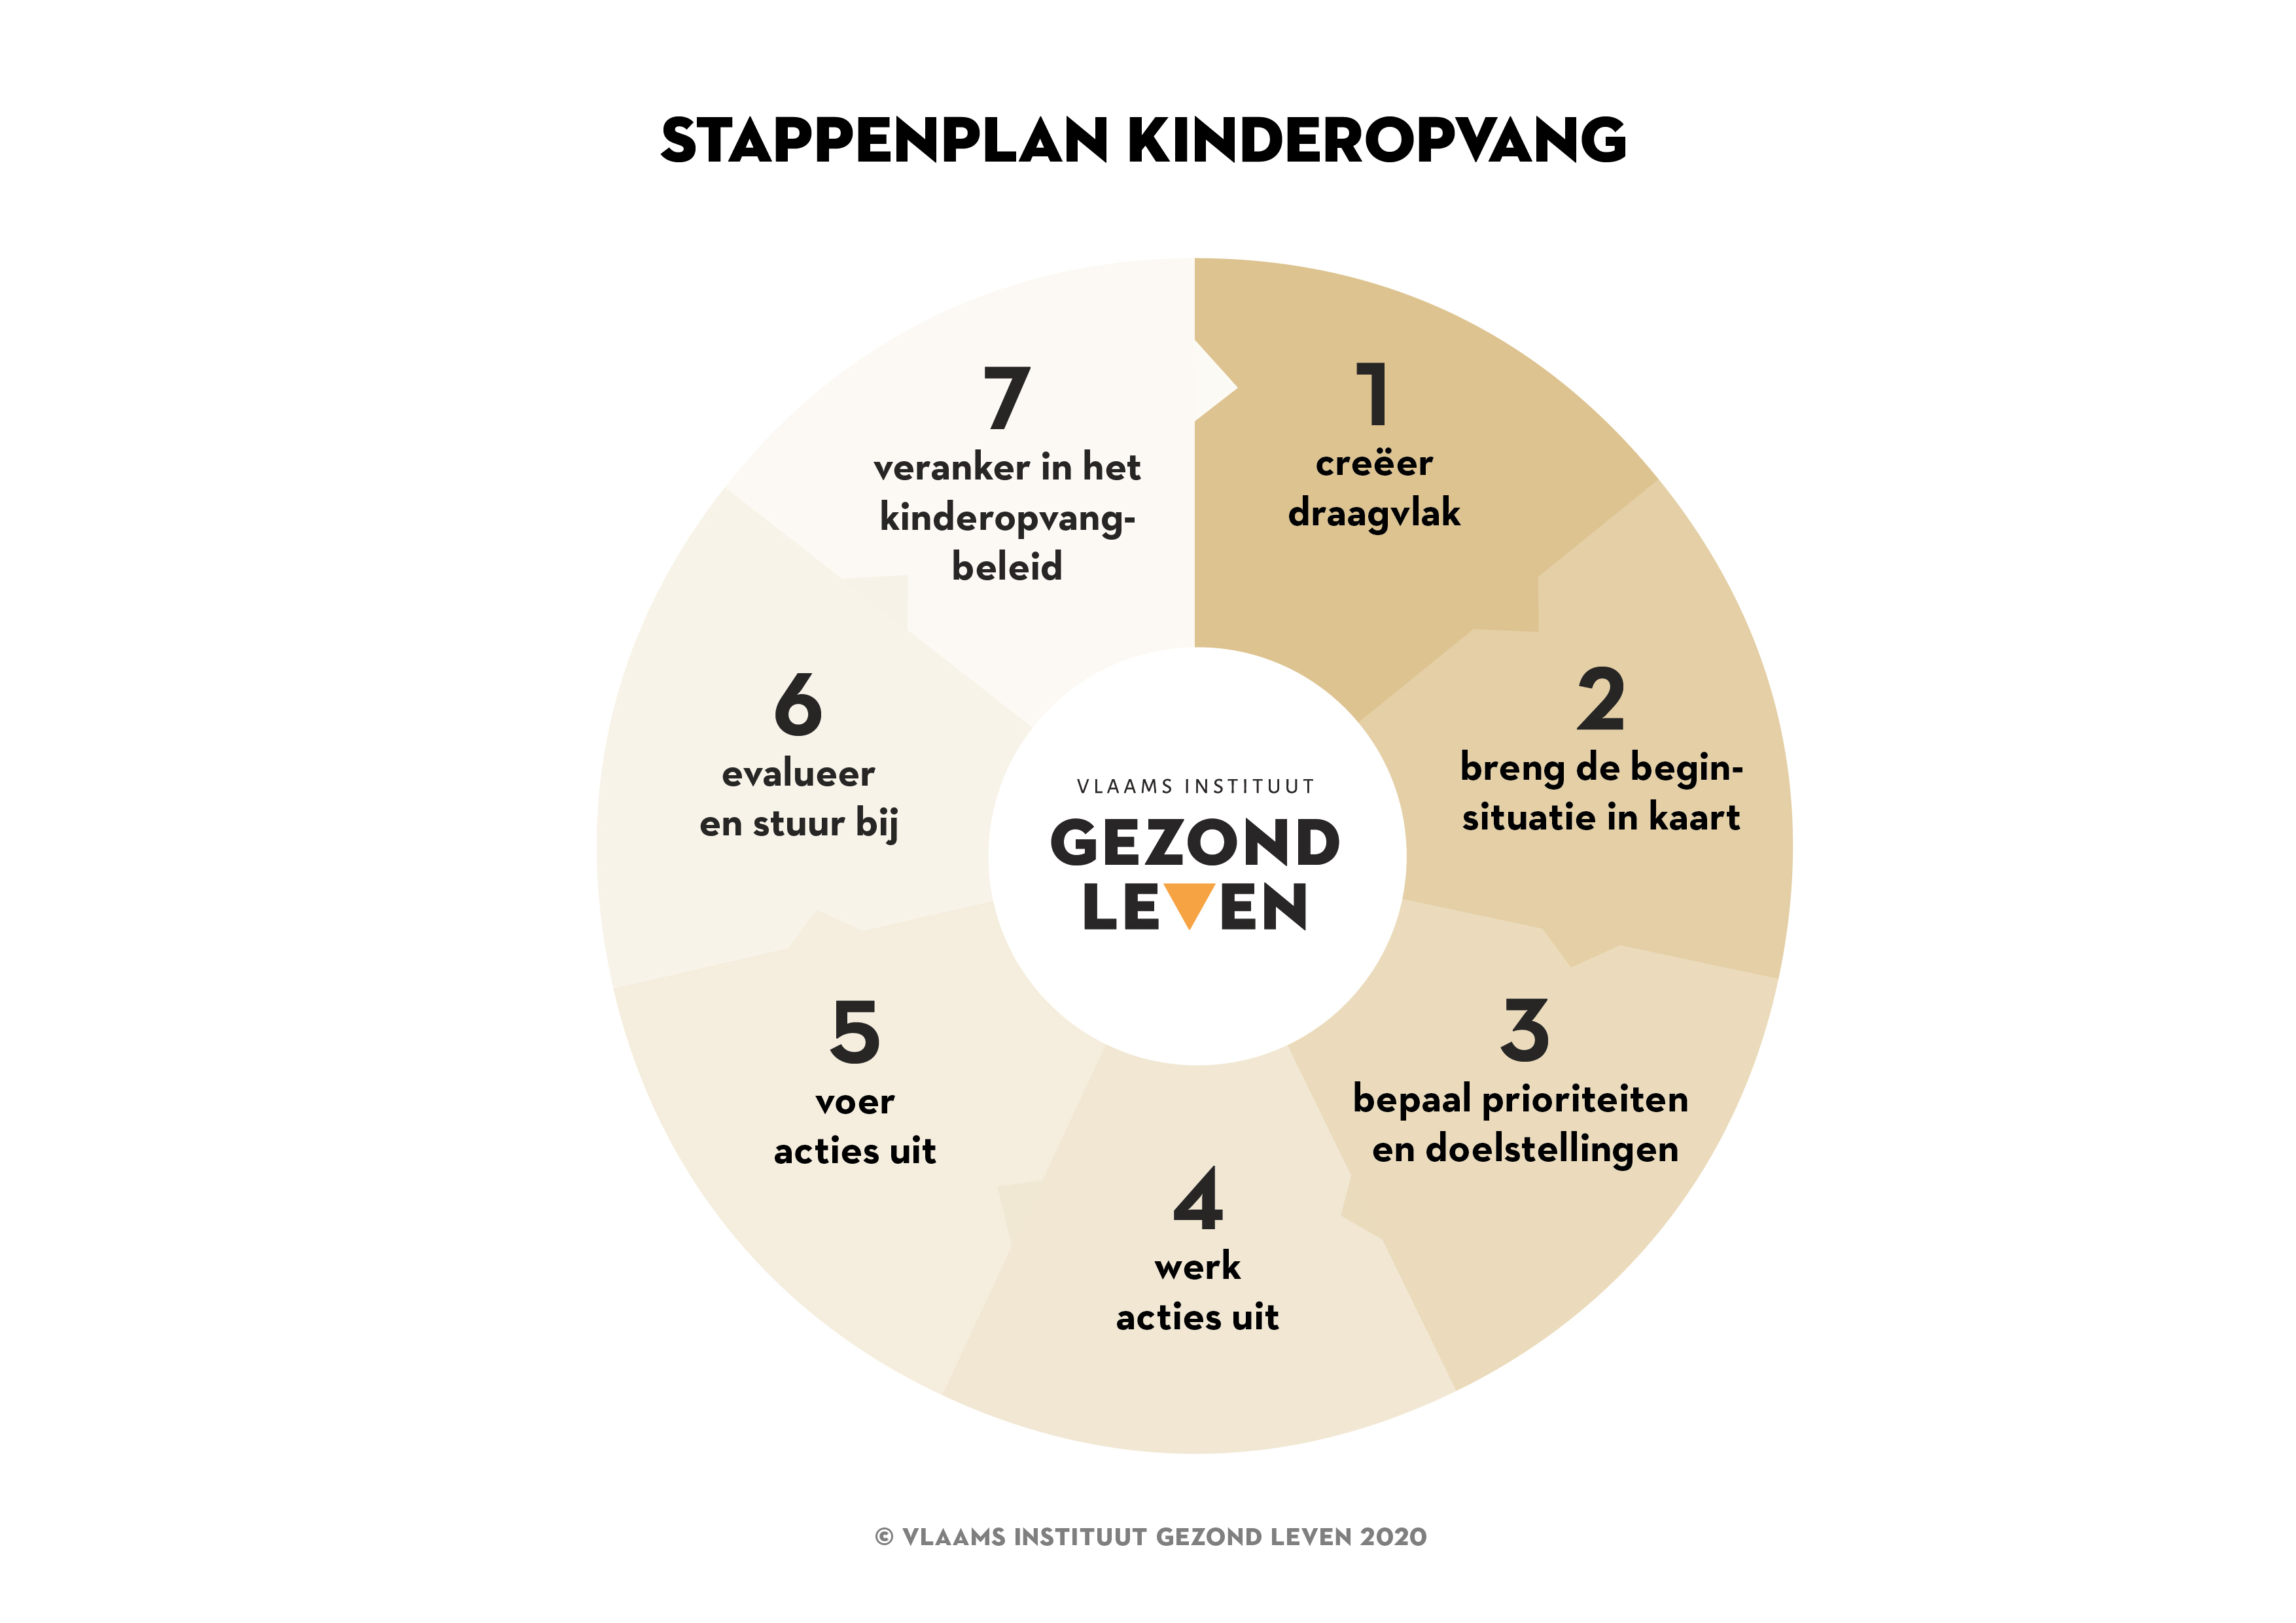 Stappenplan Kinderopvang